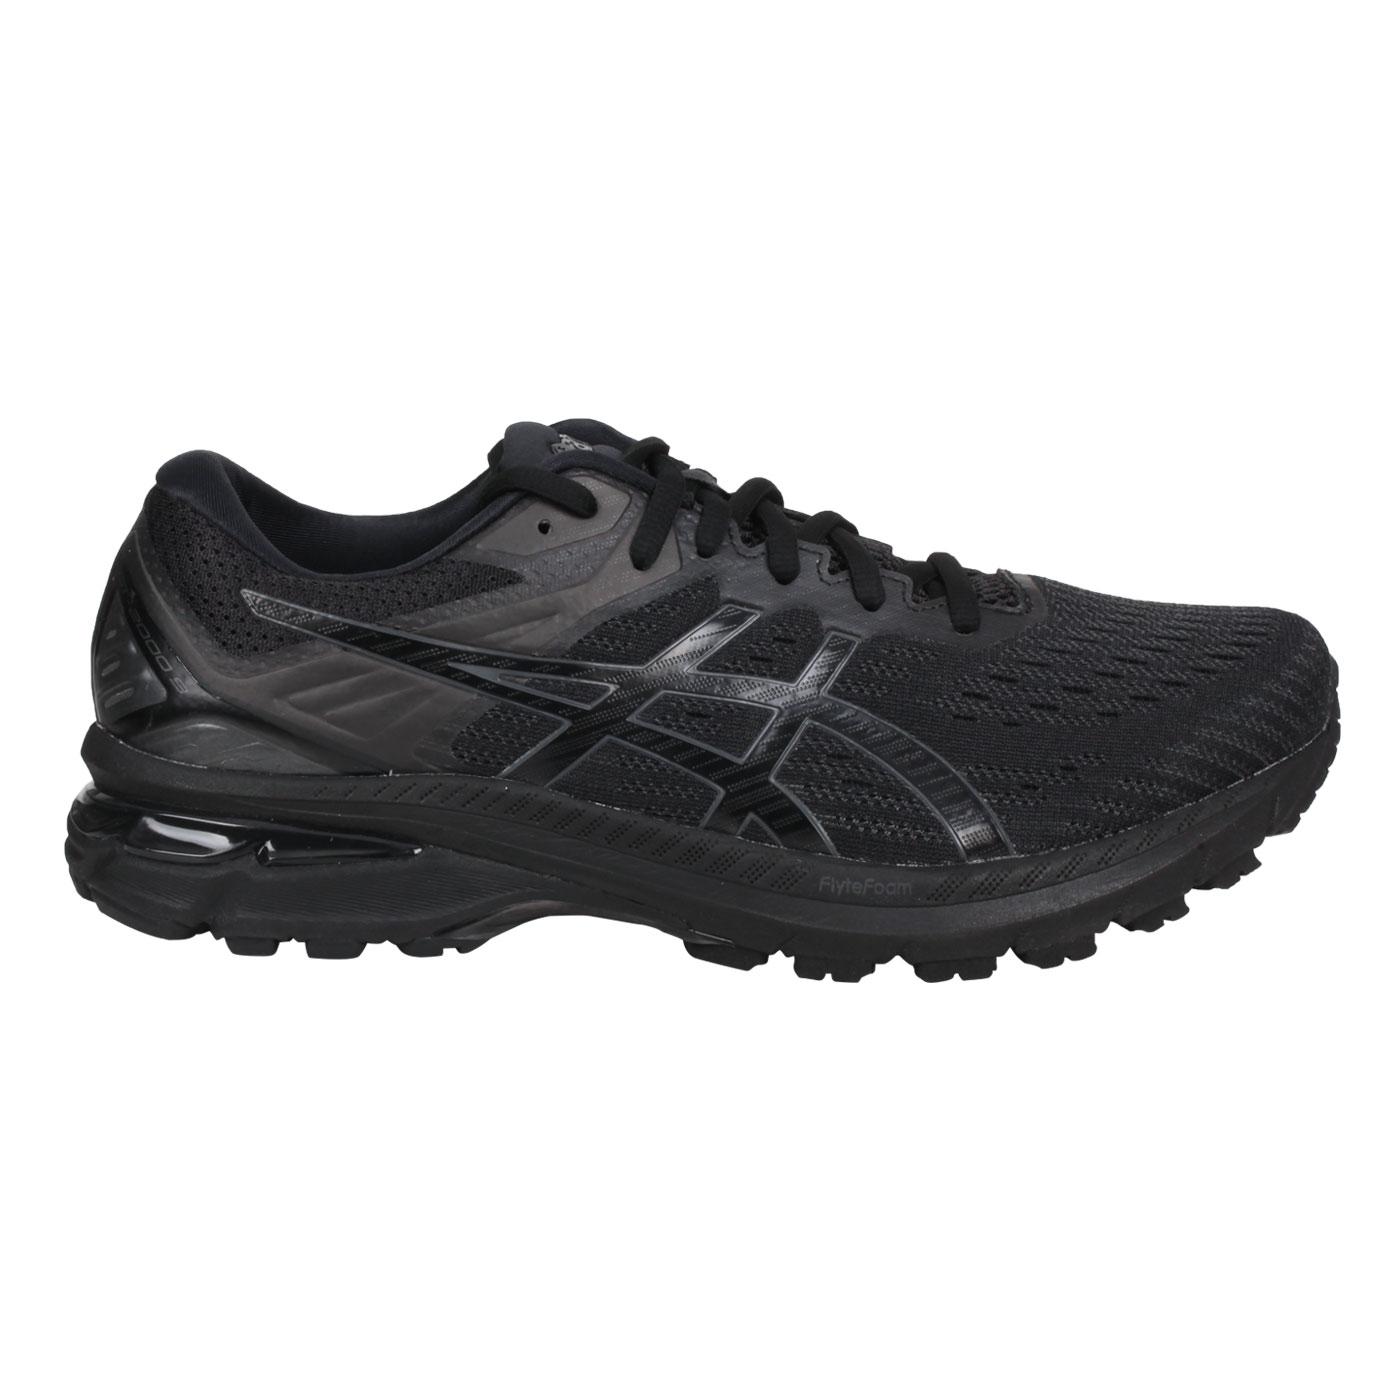 ASICS 男款慢跑鞋-4E  @GT-2000 9@1011A987-002 - 黑